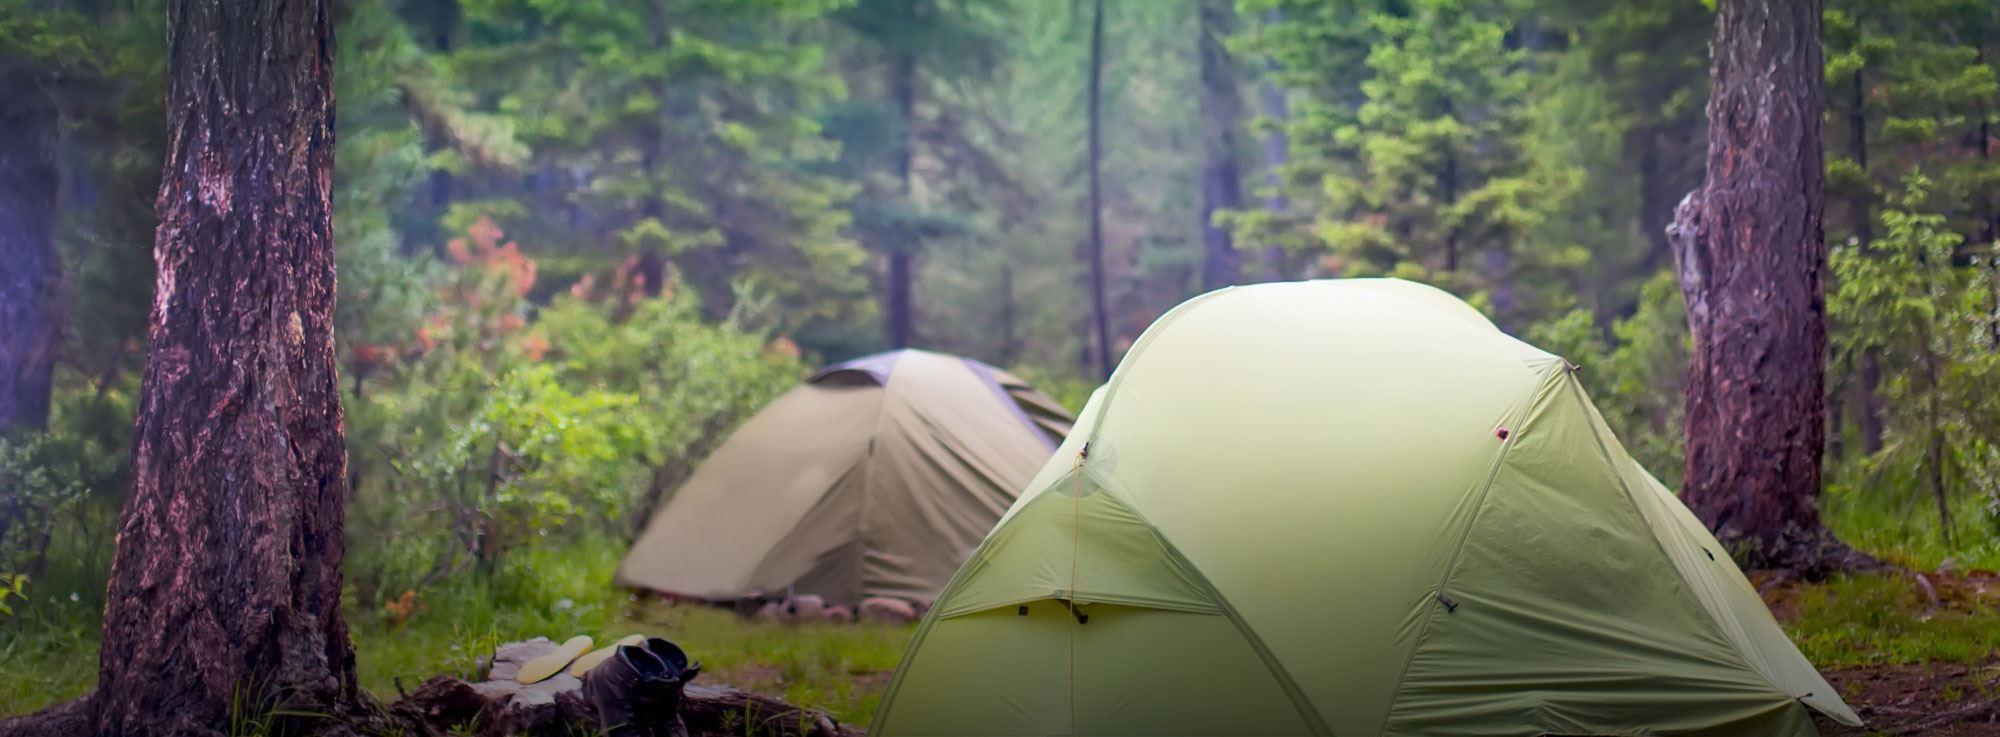 puglia campeggi